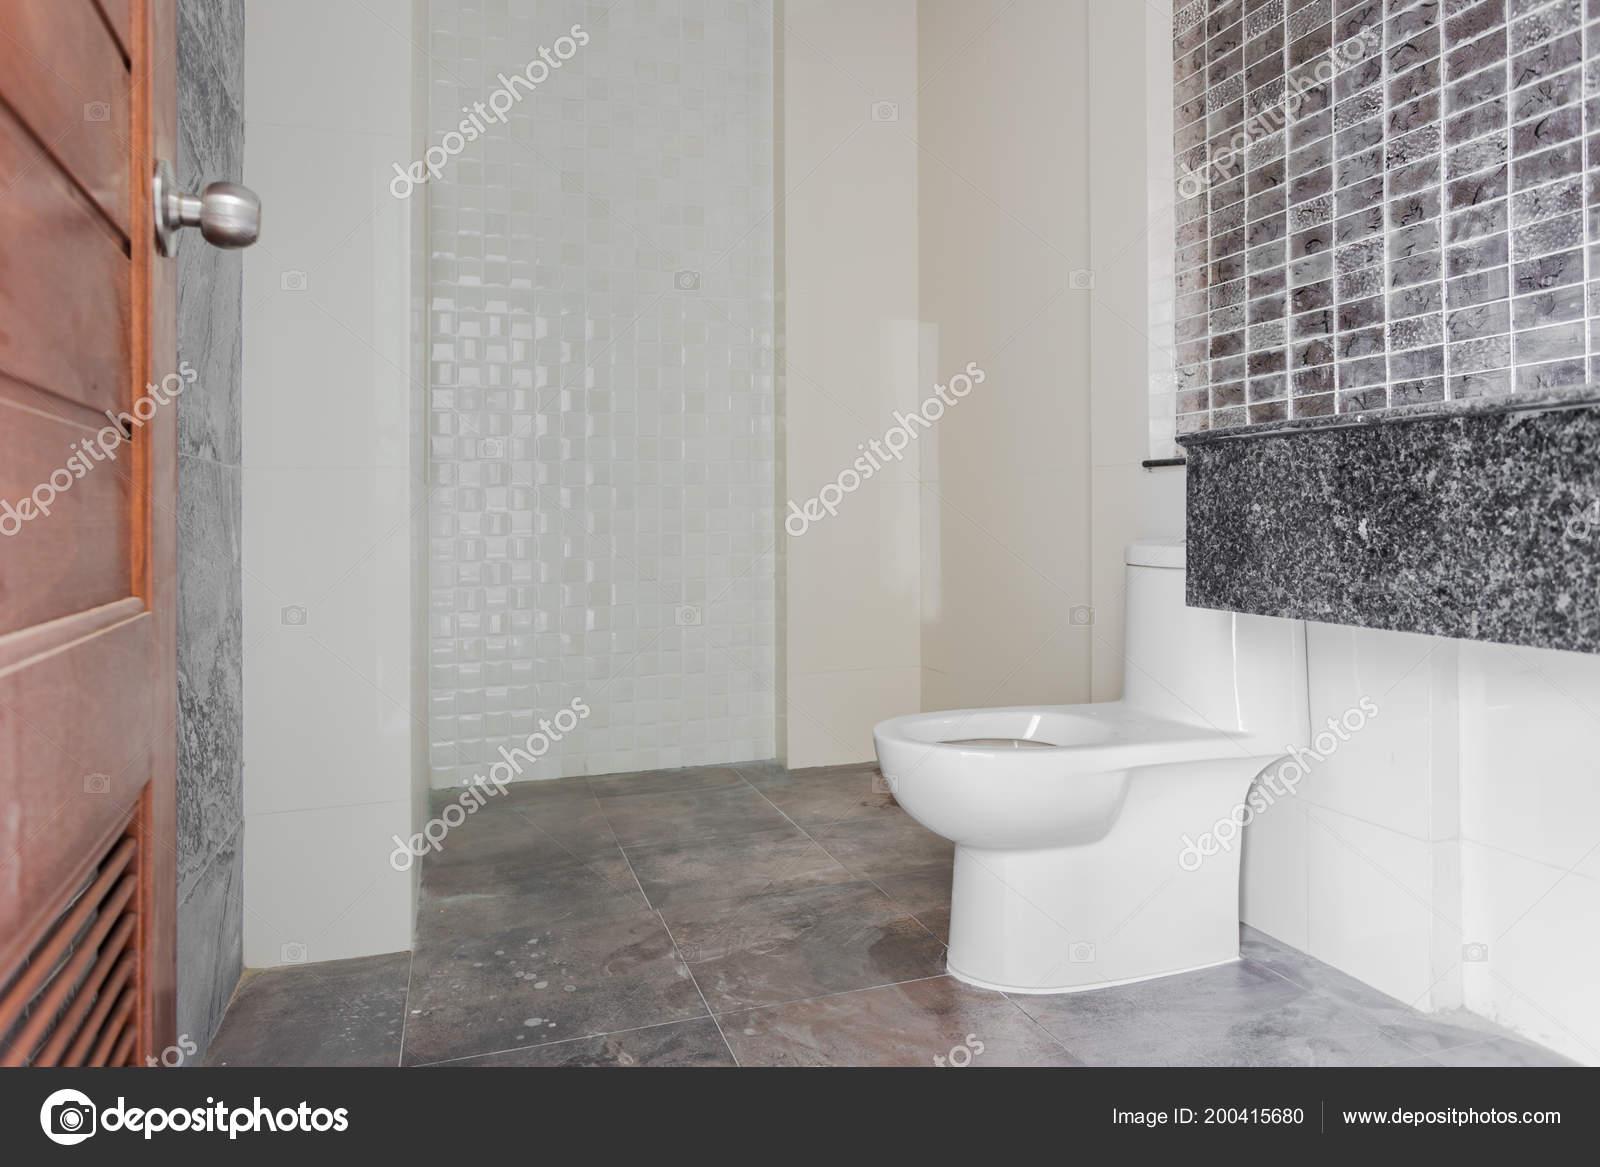 Accueil Salle Bain Design Moderne Blanc Sanitaires Dans ...